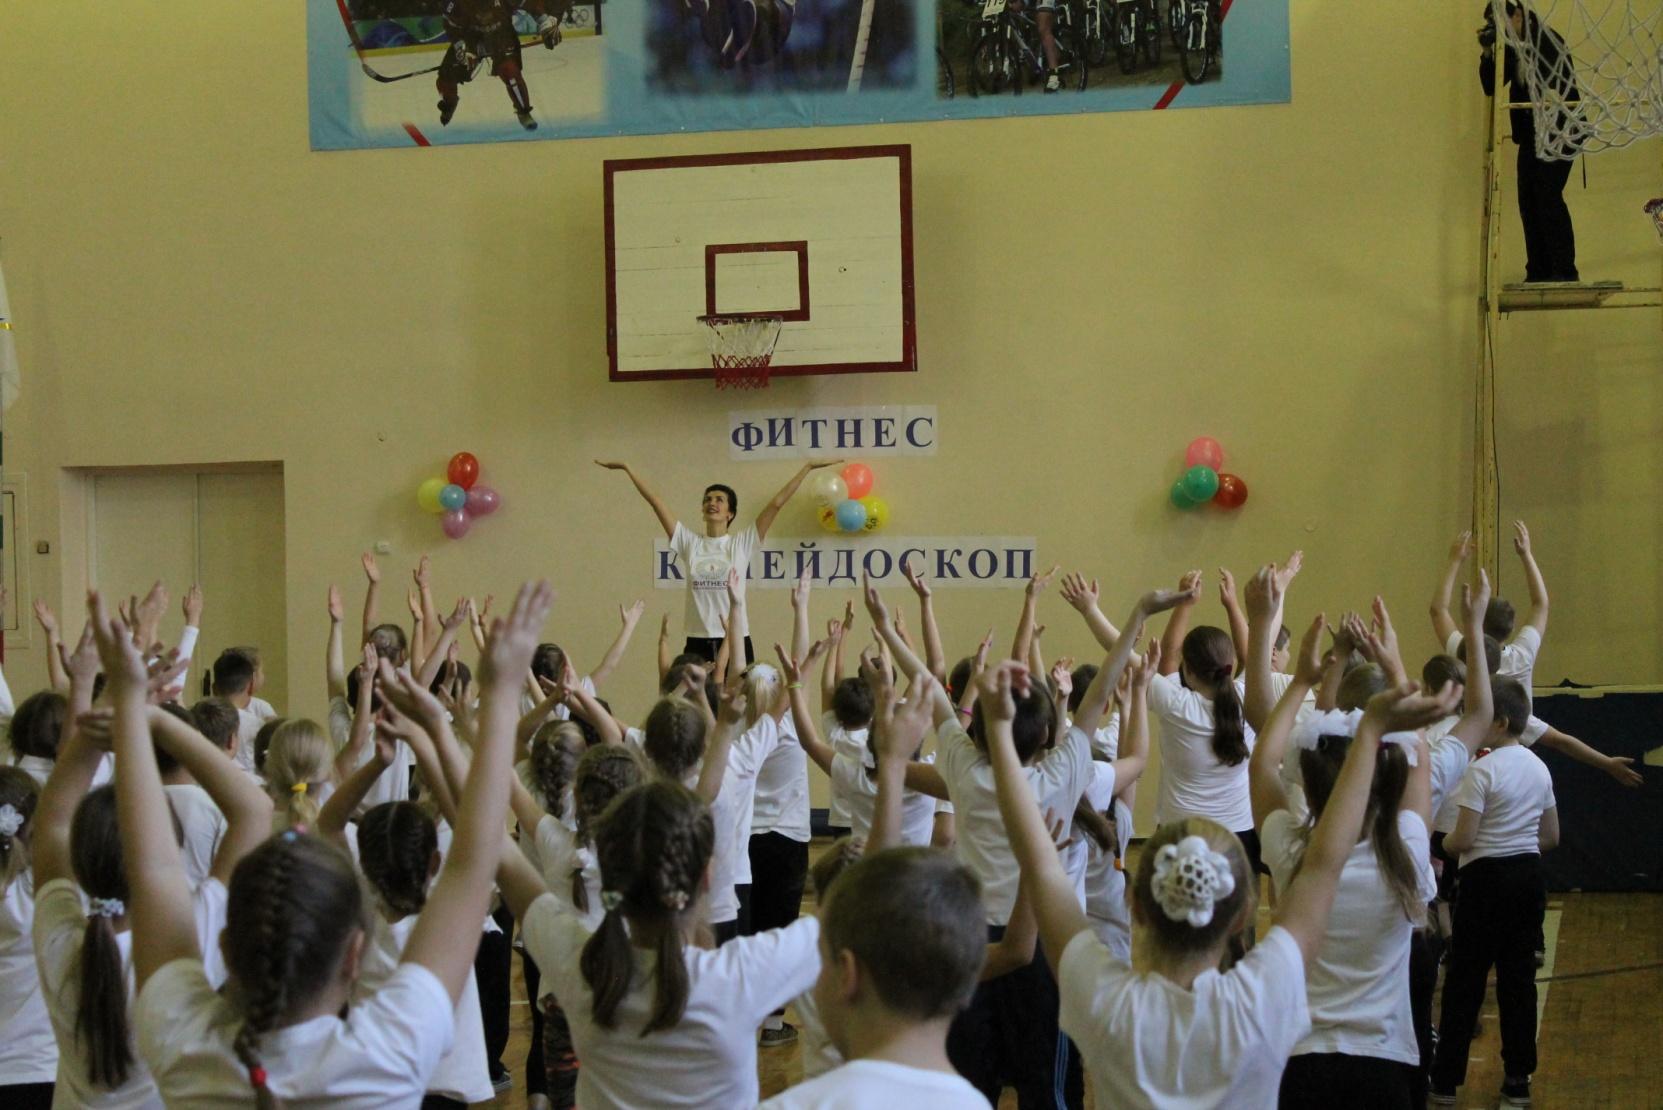 D:\фото\школа2015\солгечная спартакиада 2015\07.10.2015 открытие СС фитнес калейдаскоп\IMG_0807.JPG